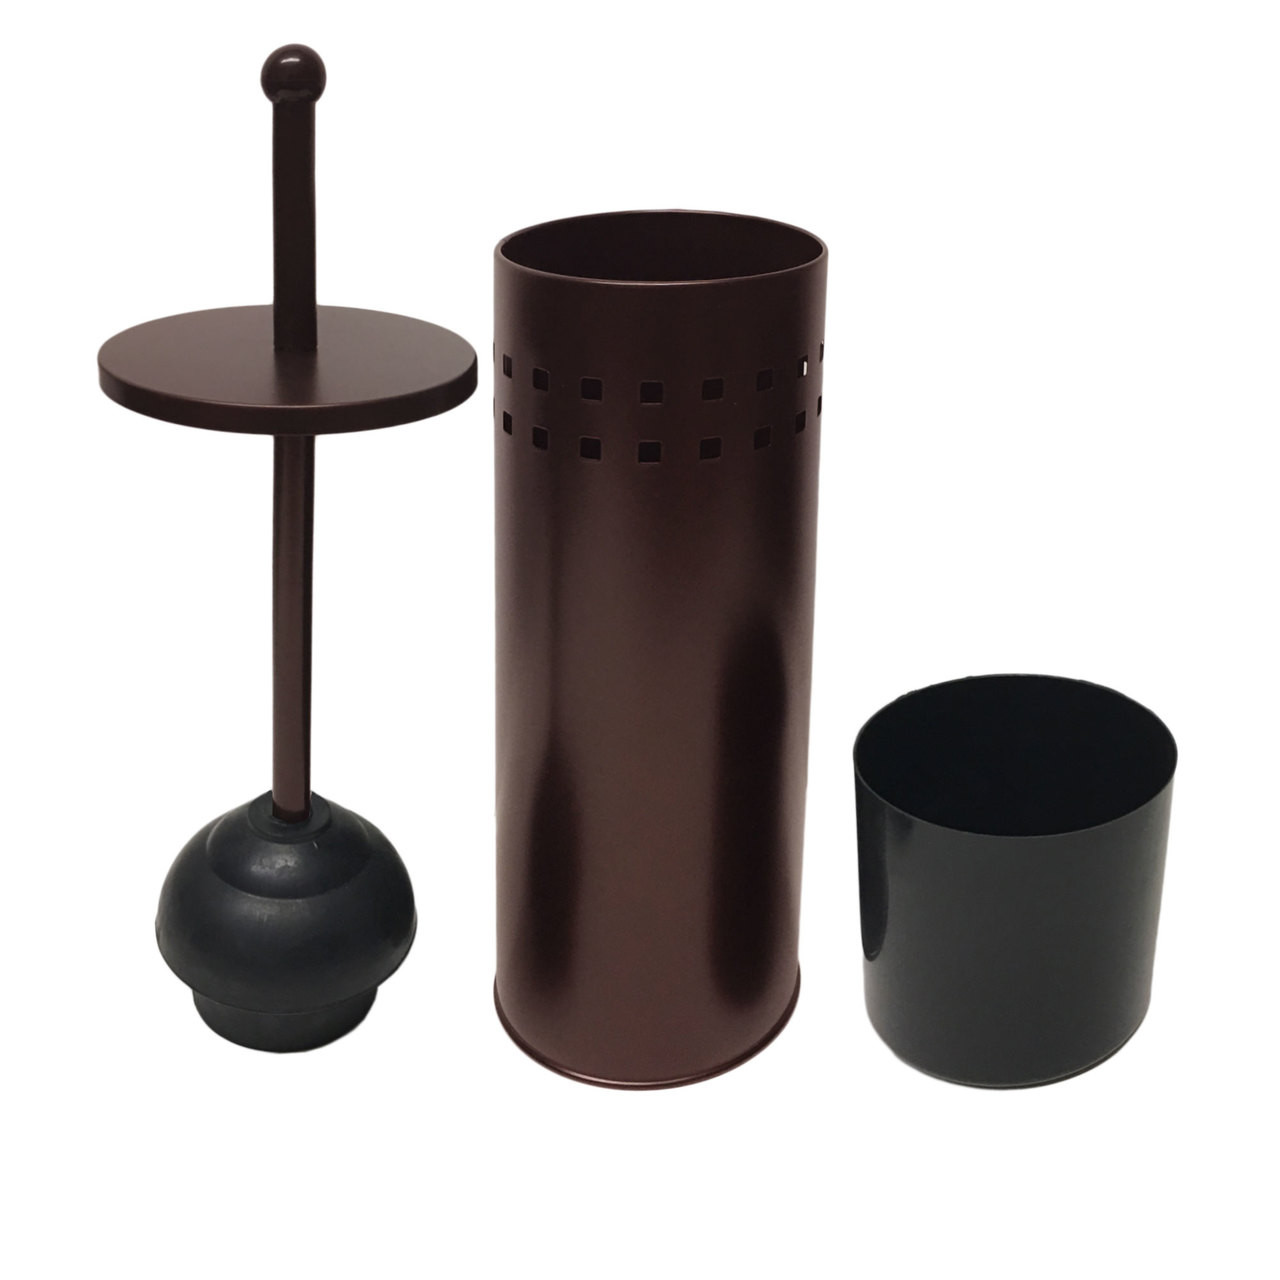 Brown Powder Coated Toilet Plunger & Holder